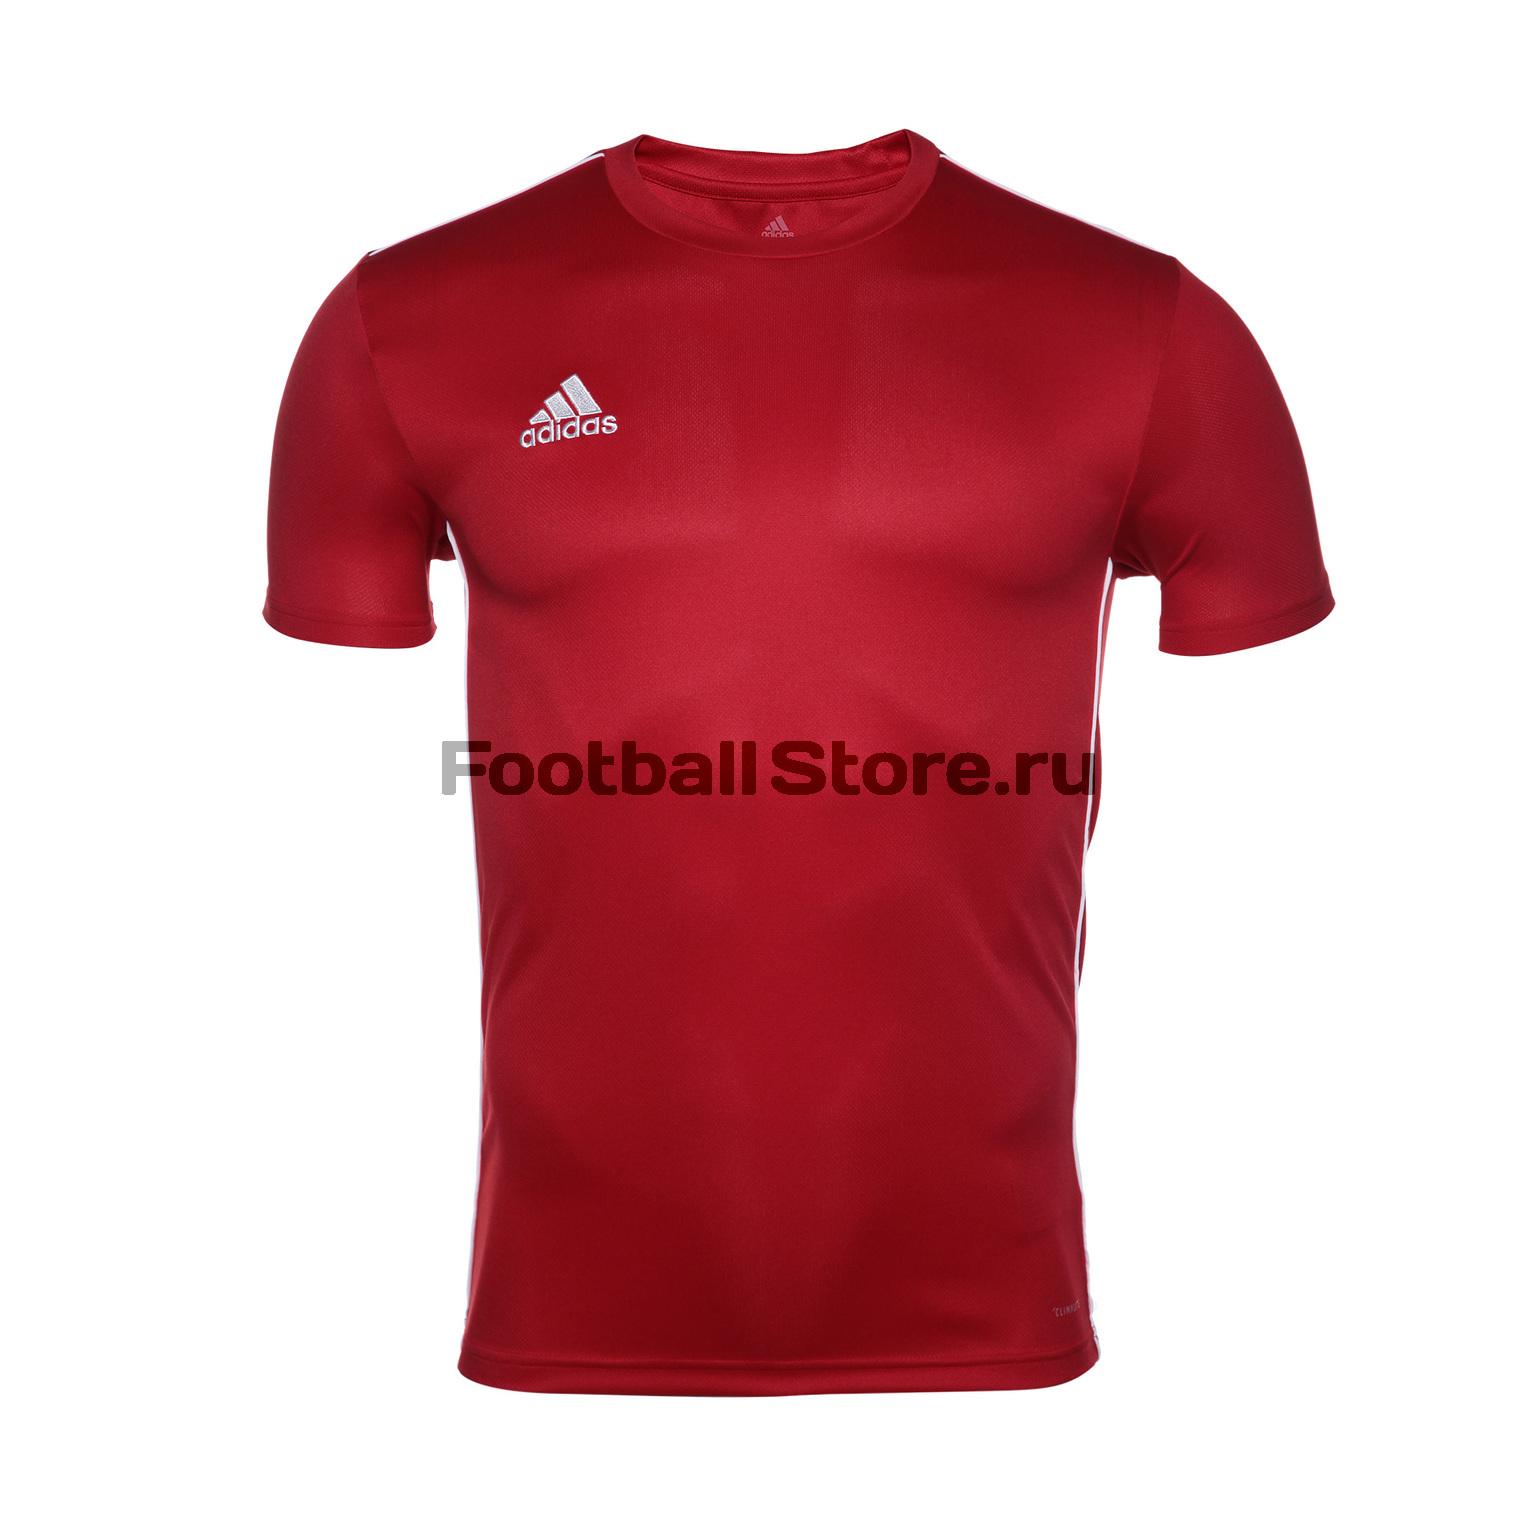 цена Футболка тренировочная Adidas Core18 JSY CV3452 онлайн в 2017 году